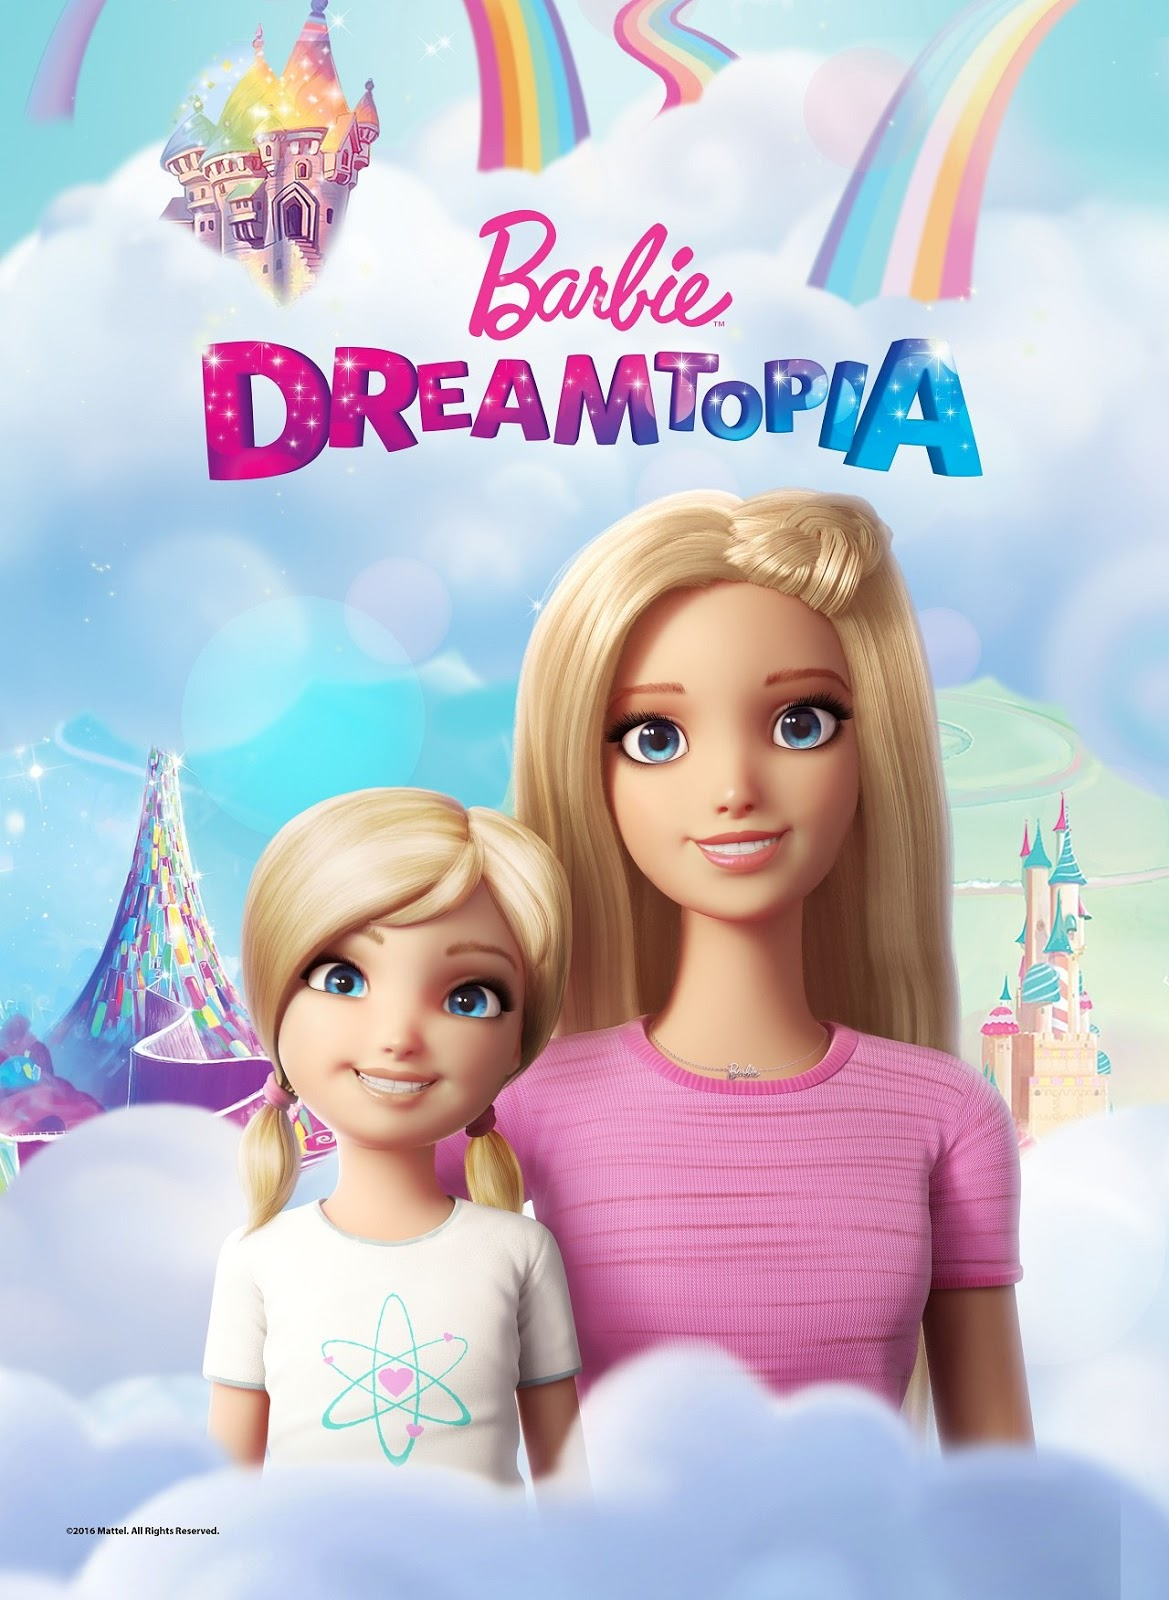 Barbie Diva Barbie Video Game Hero Dreamtopia Amp Series